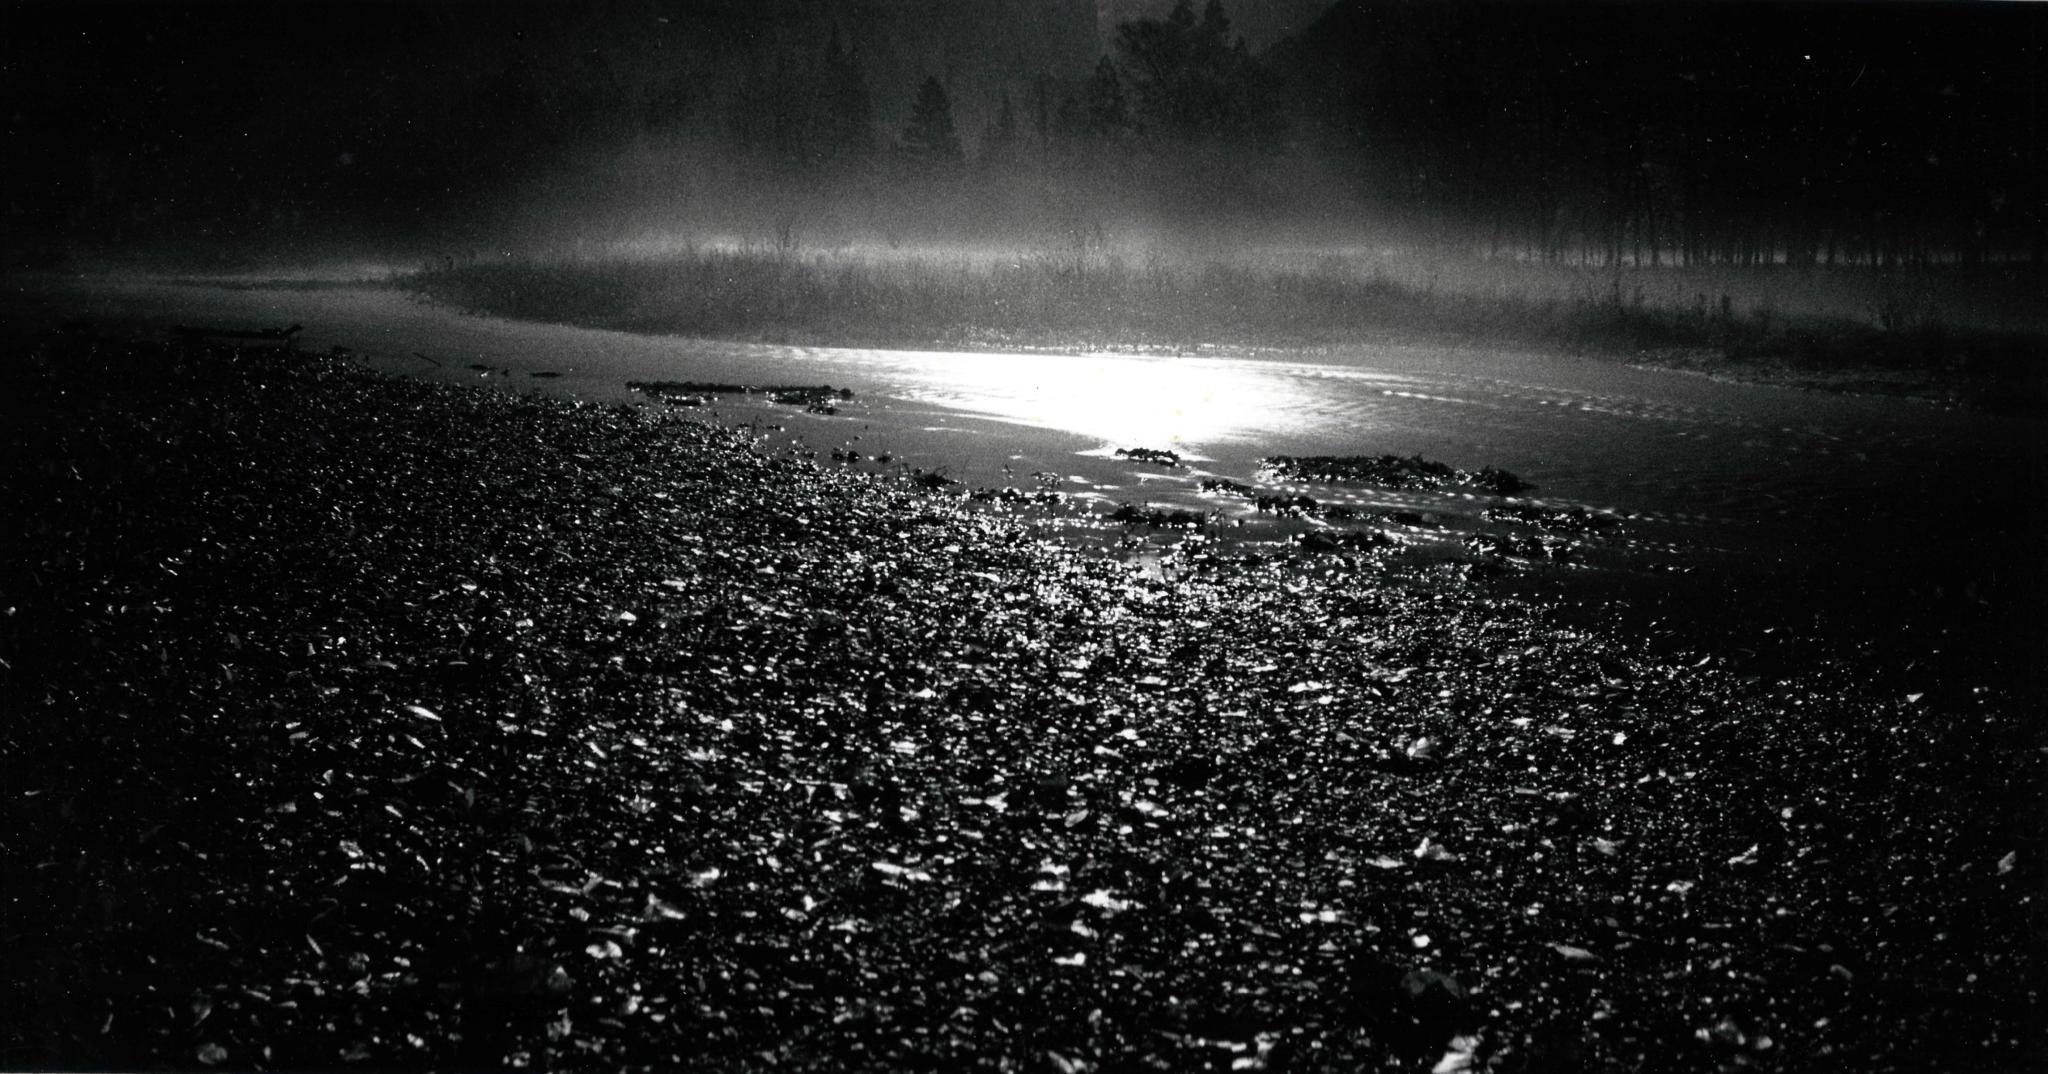 Steamy Moonlit Meadow, Yosemite Valley by downwindpassage